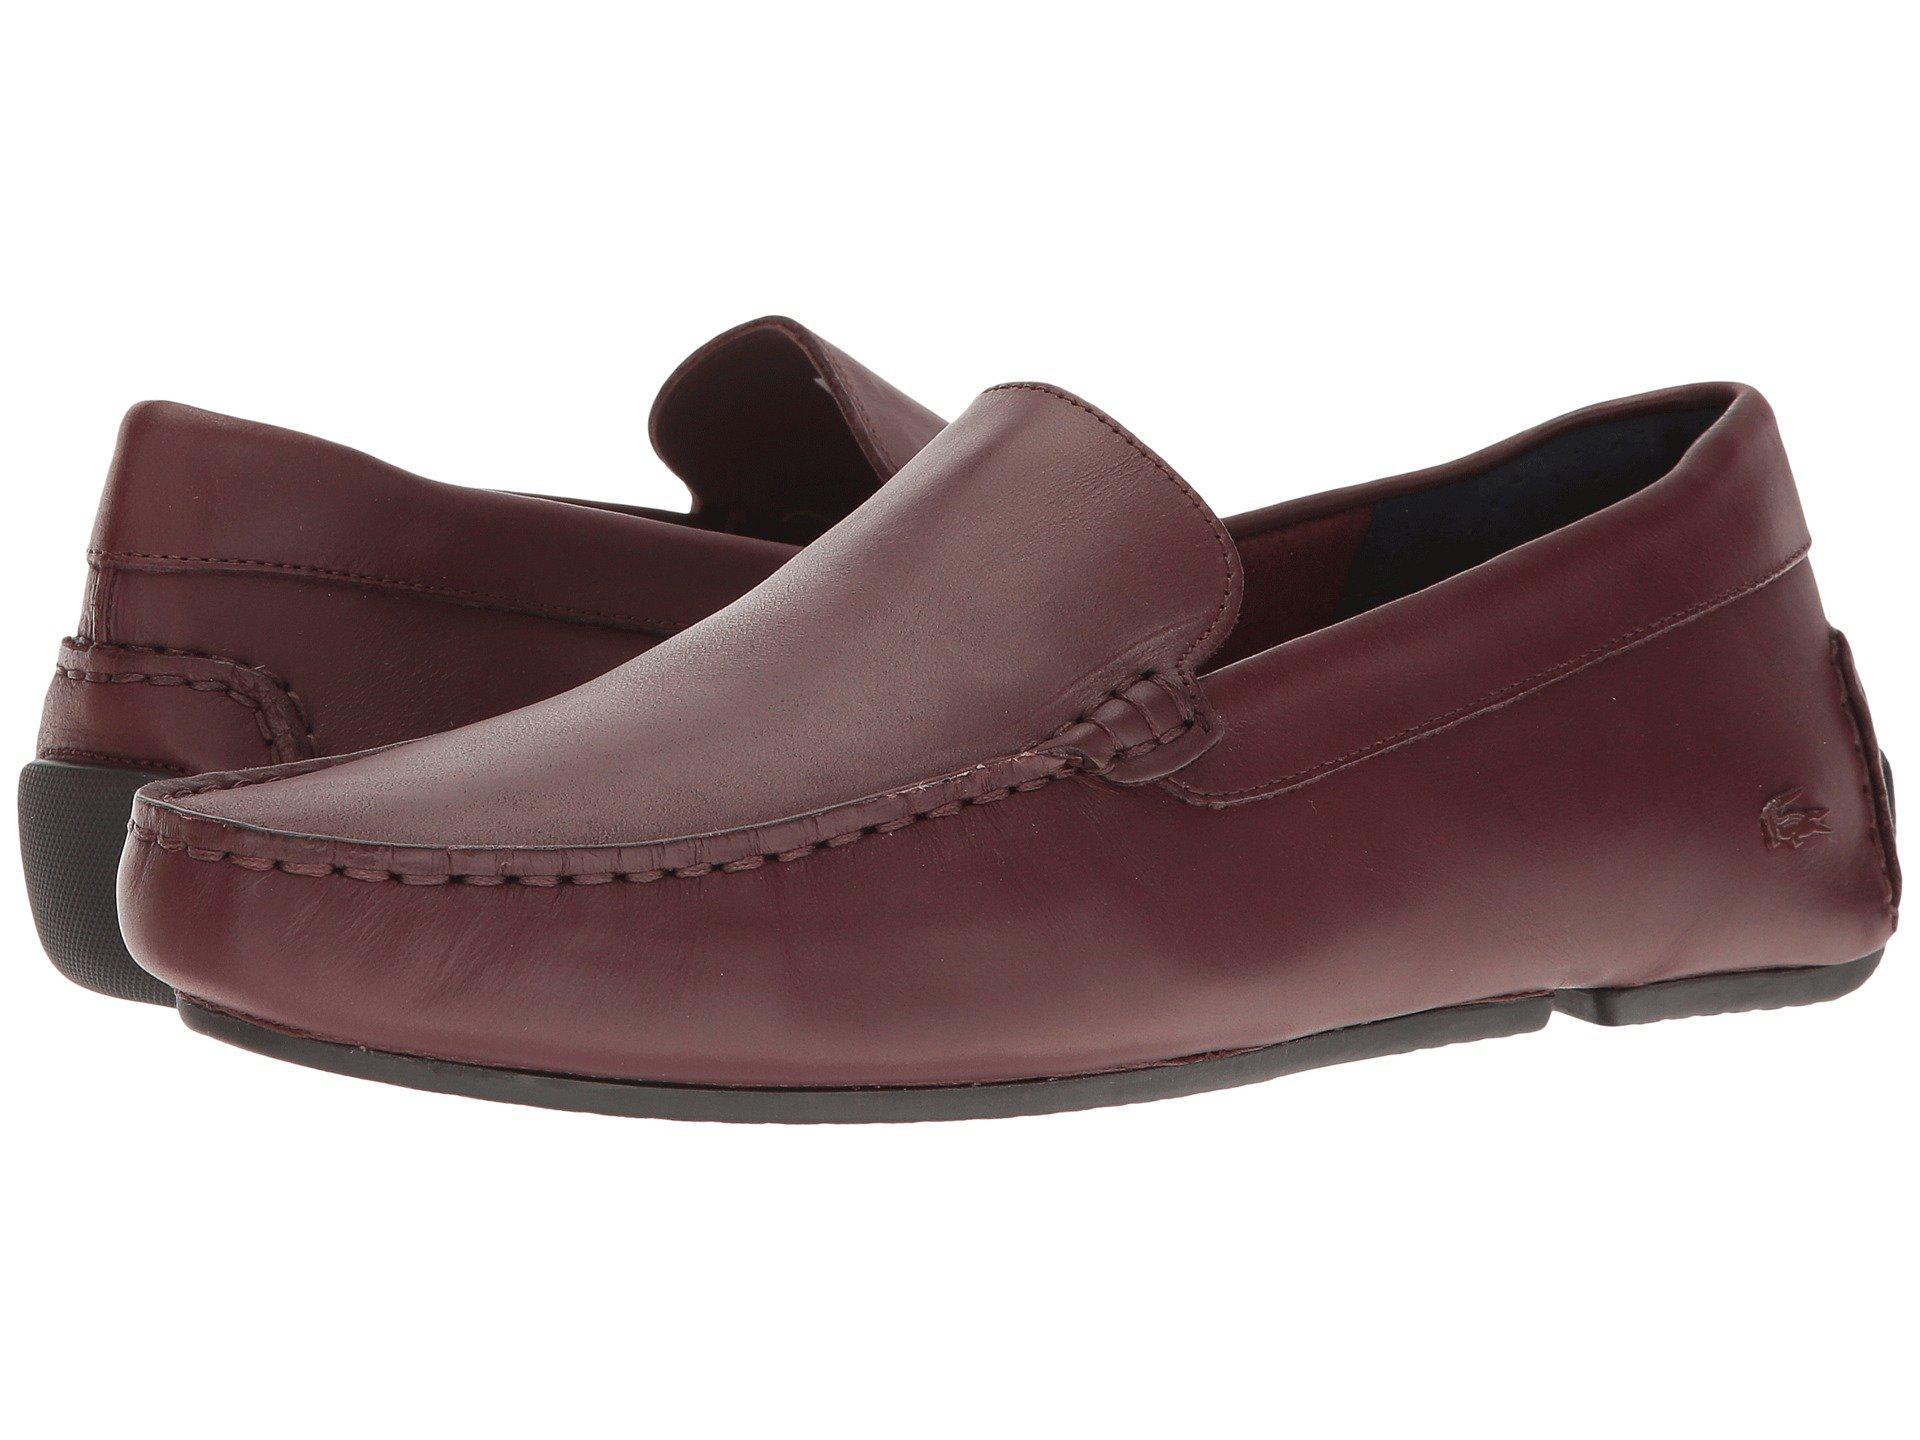 8cb30e2e901f05 Lyst - Lacoste Piloter 117 1 Formal Shoe Fashion Sneaker in Brown ...